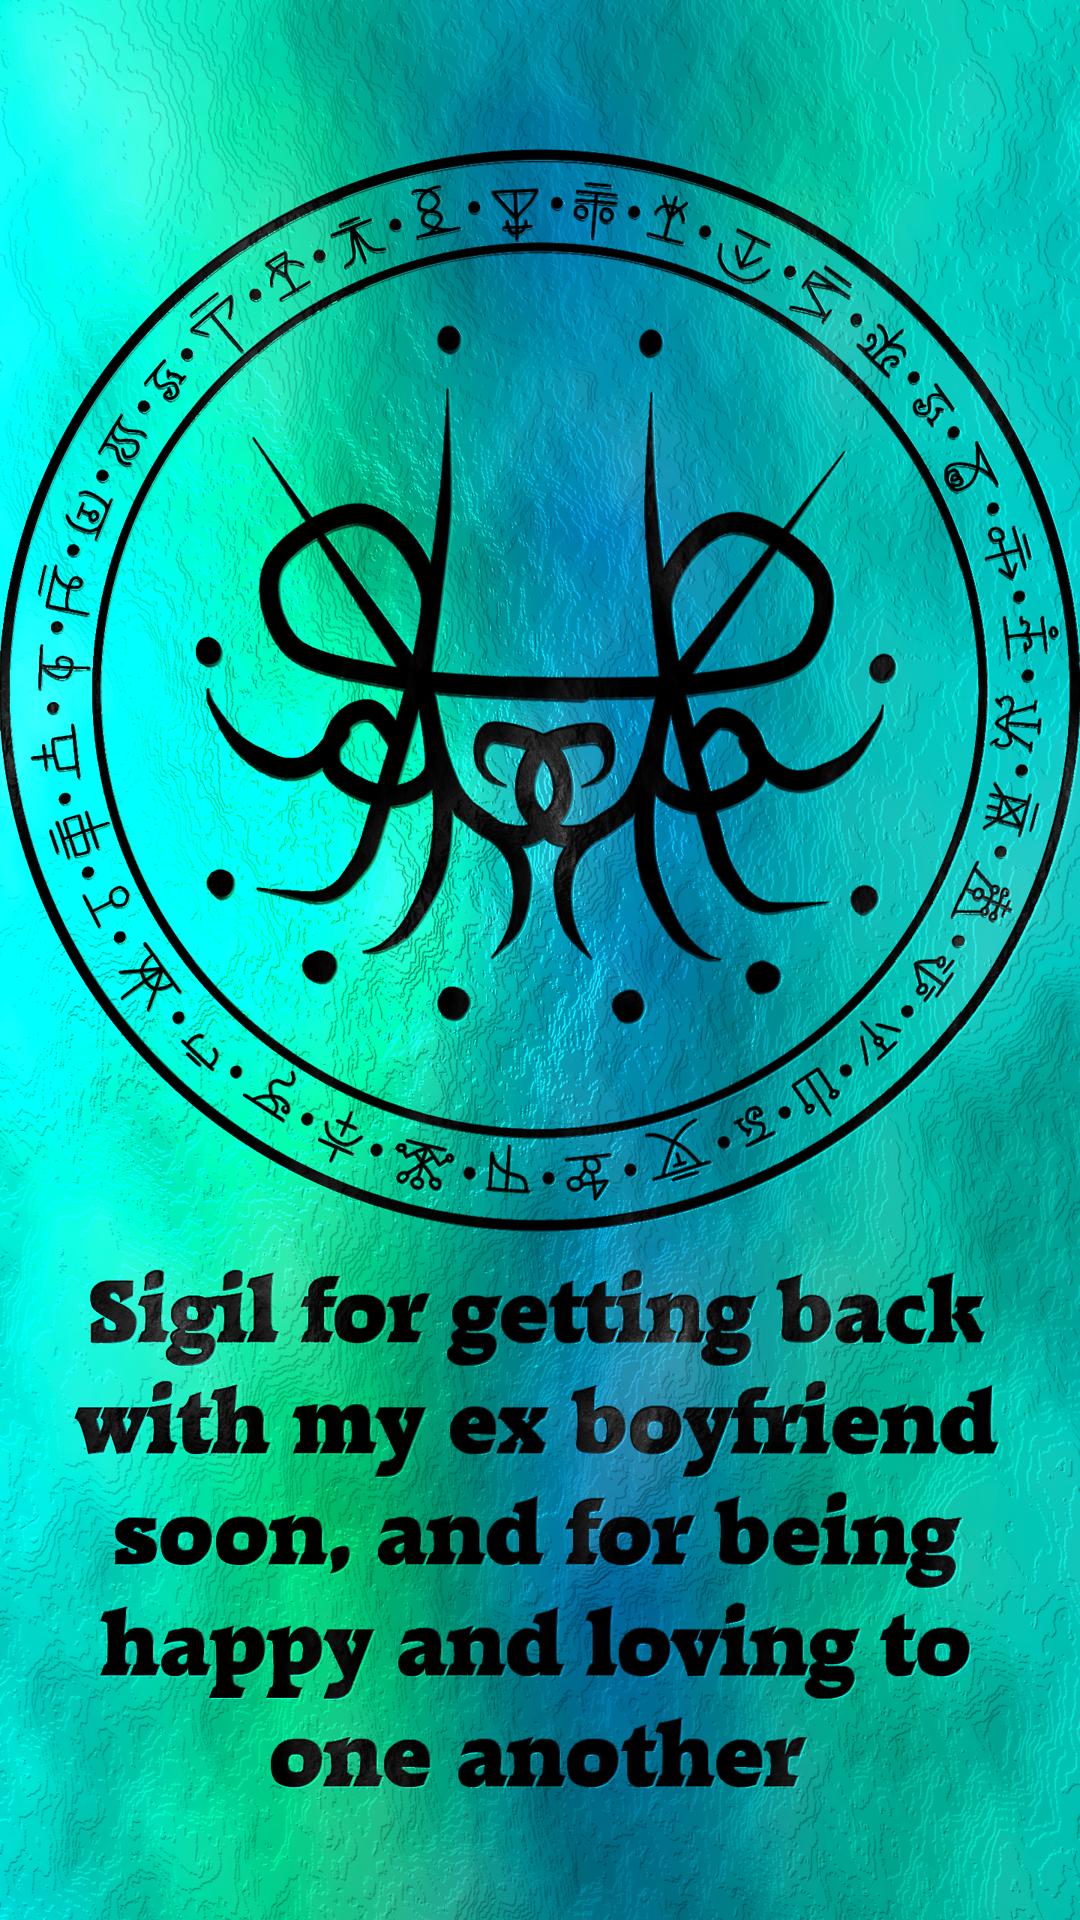 should i get back with my boyfriend